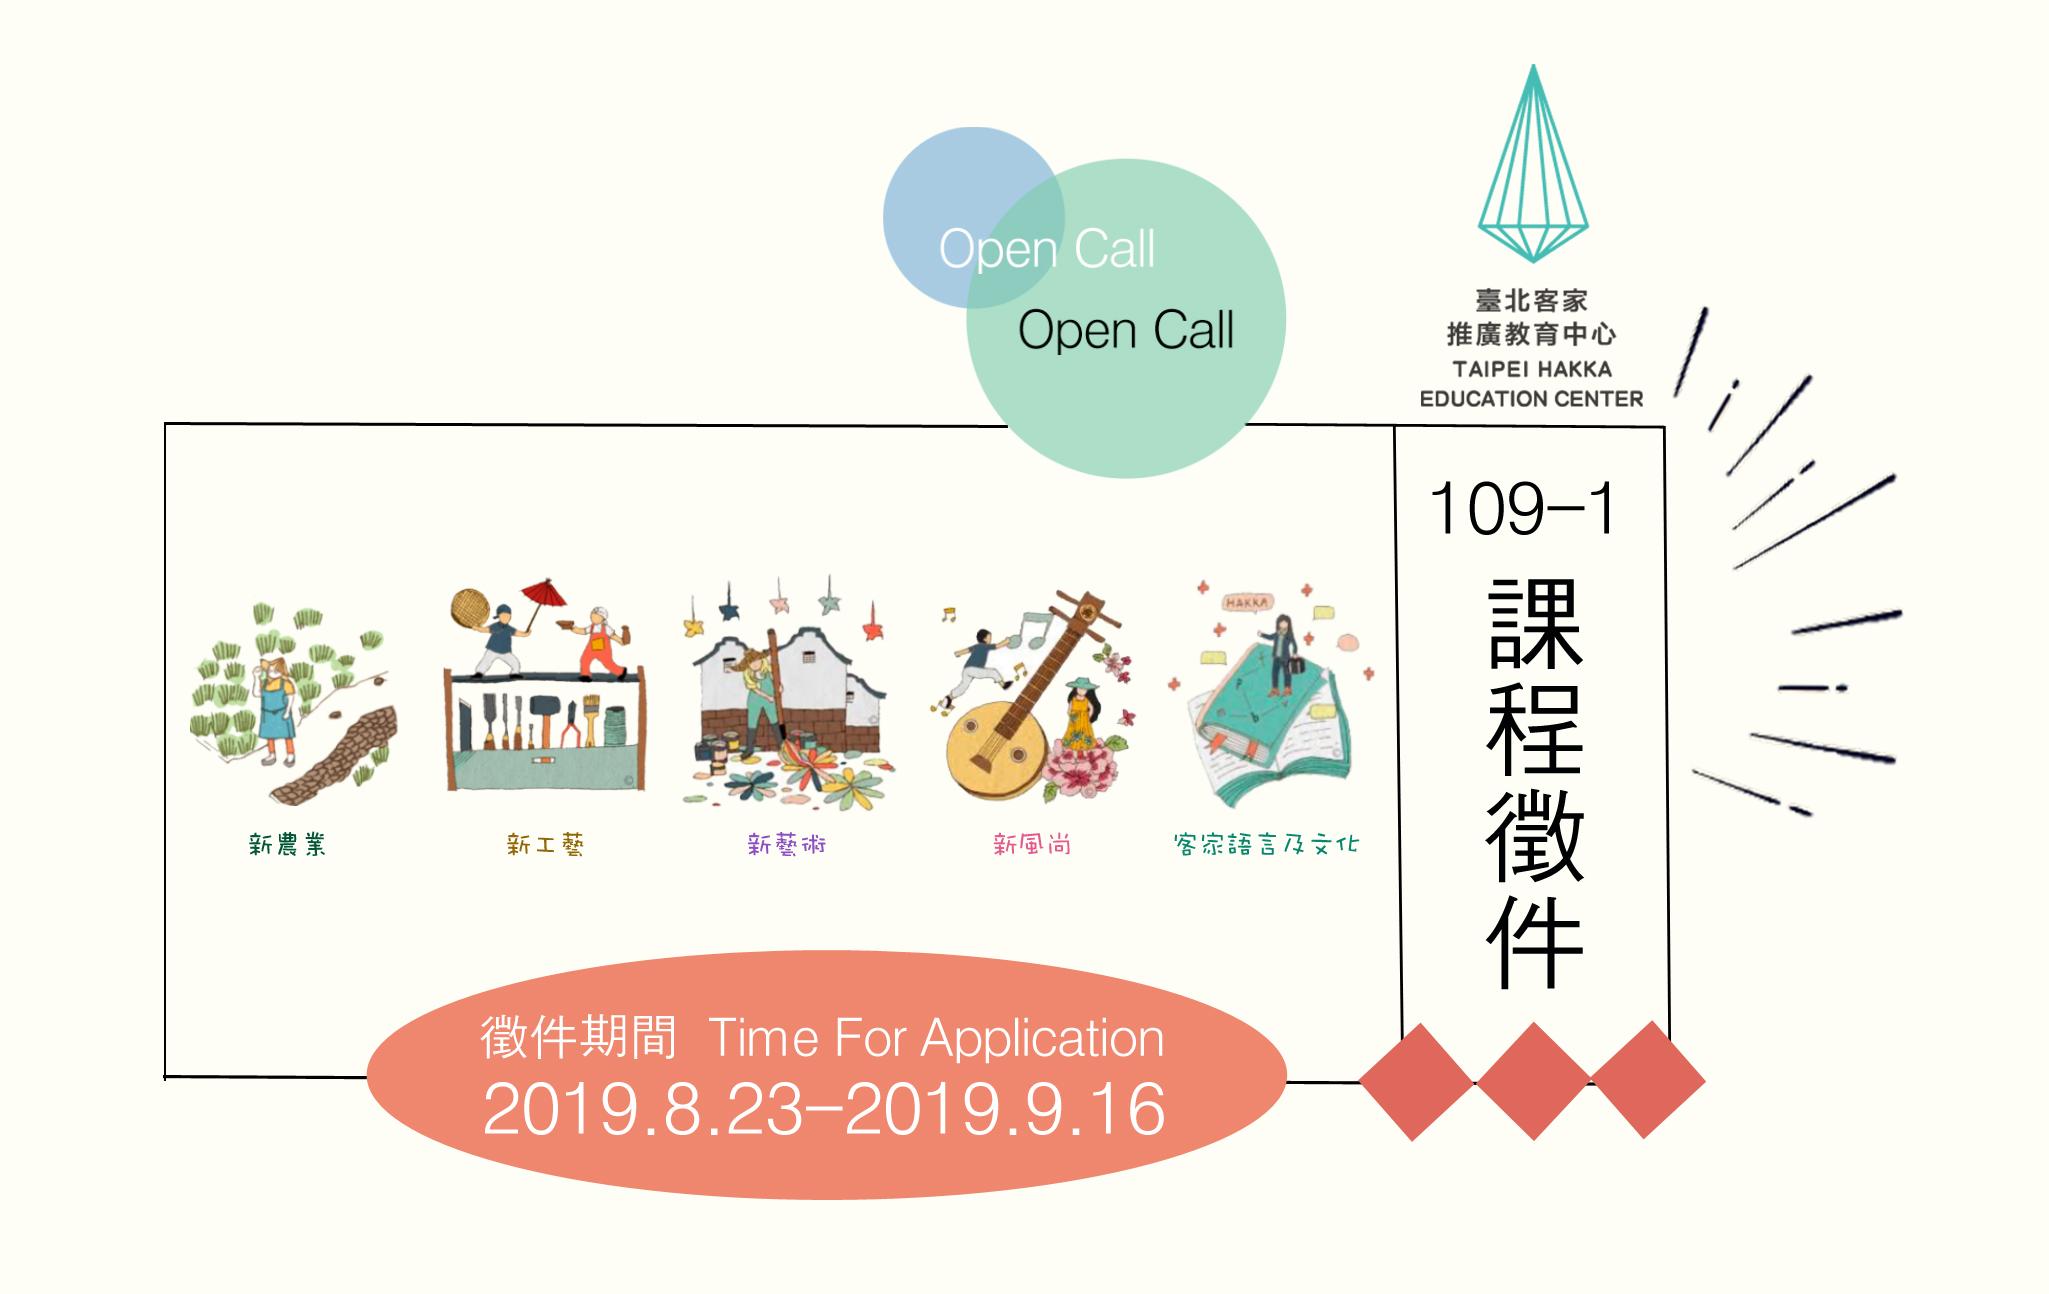 課程徵件109-1 banner.jpg